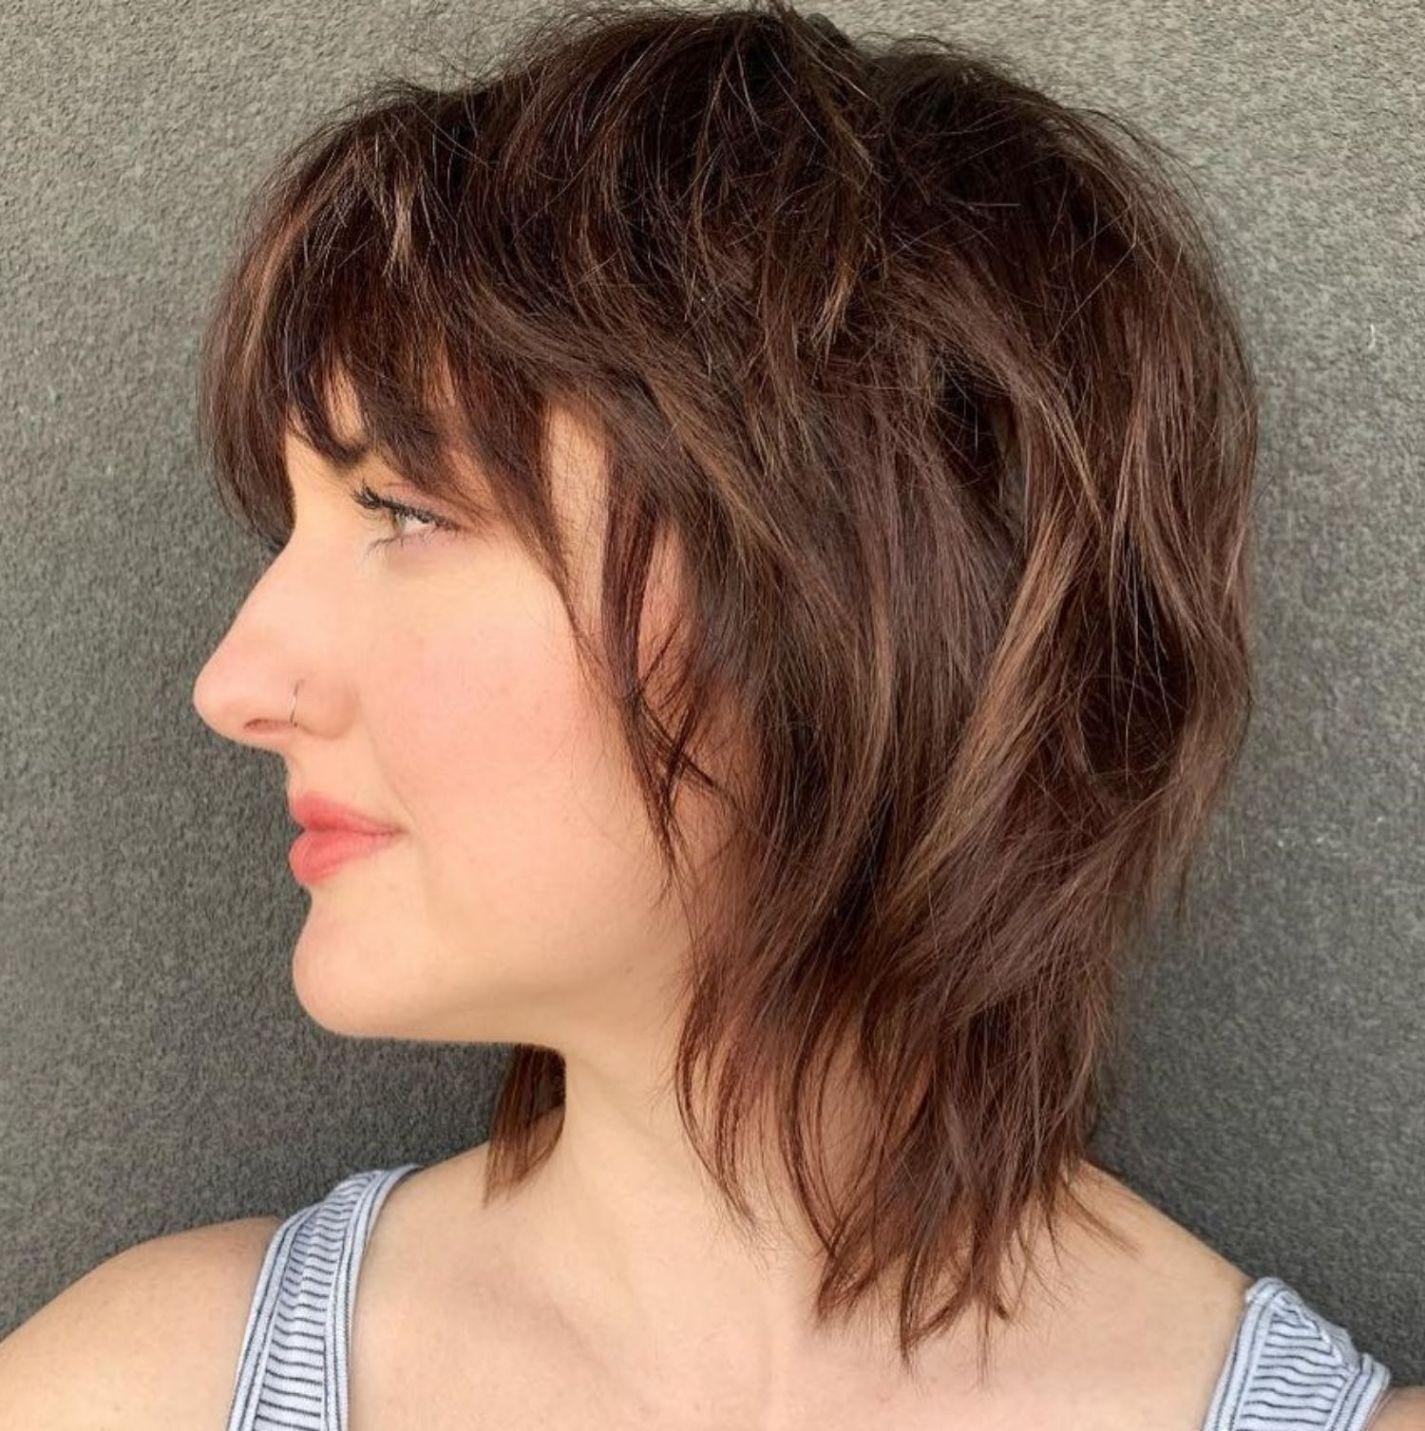 Shorter Choppy Shaggy Haircut With Bangs In 2020 Medium Shag Haircuts Shag Haircut Shaggy Haircuts